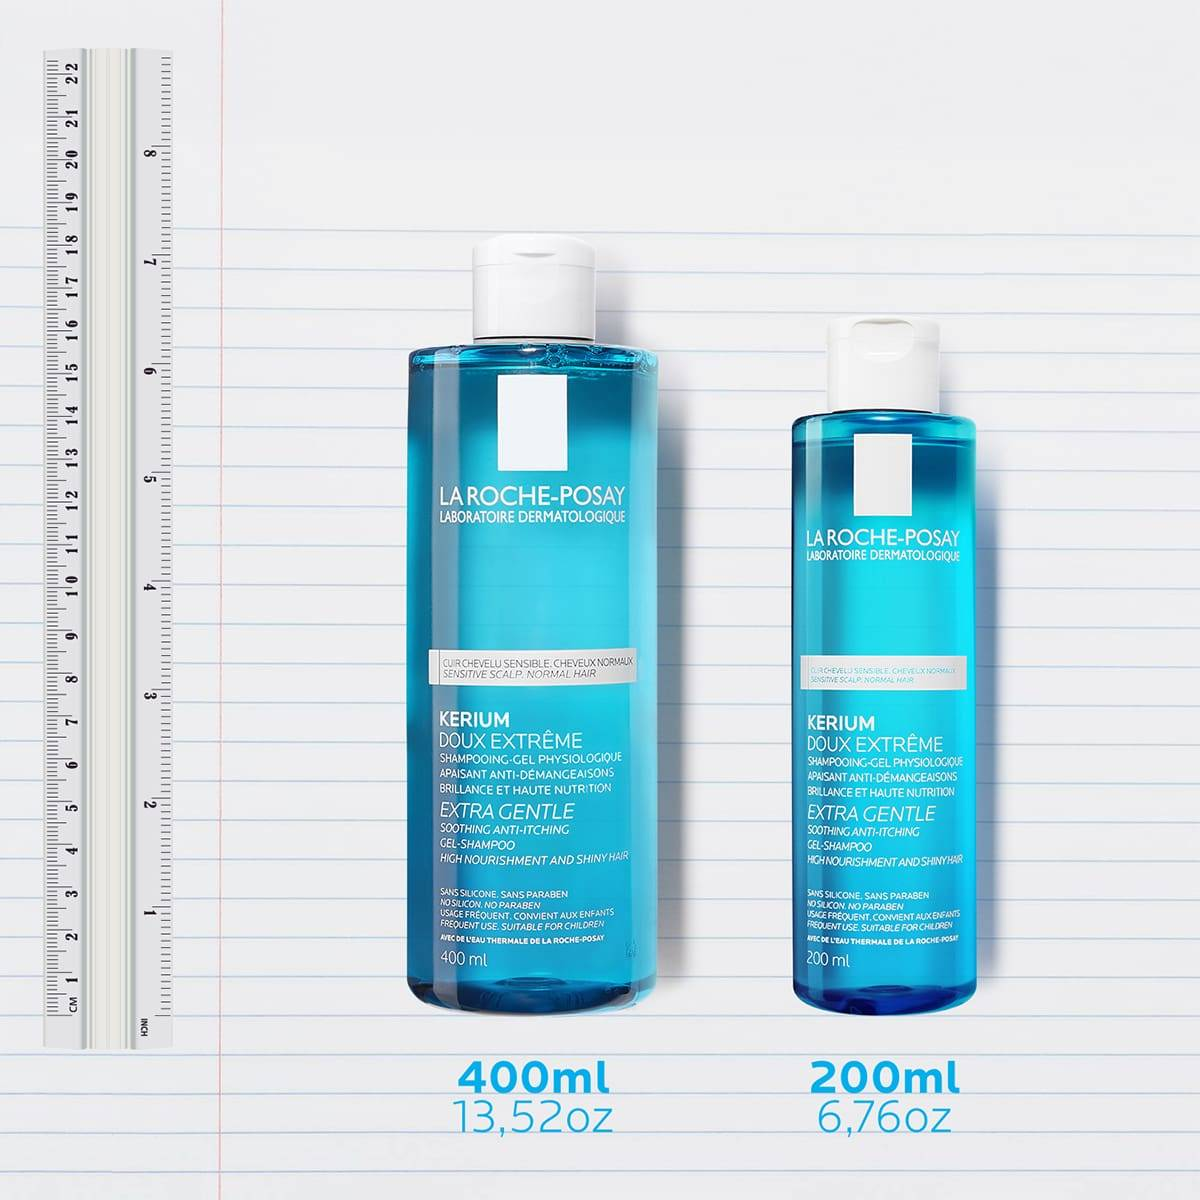 La Roche Posay ProduktSide Kerium Extra Gentle Gel Shampoo Family 3337